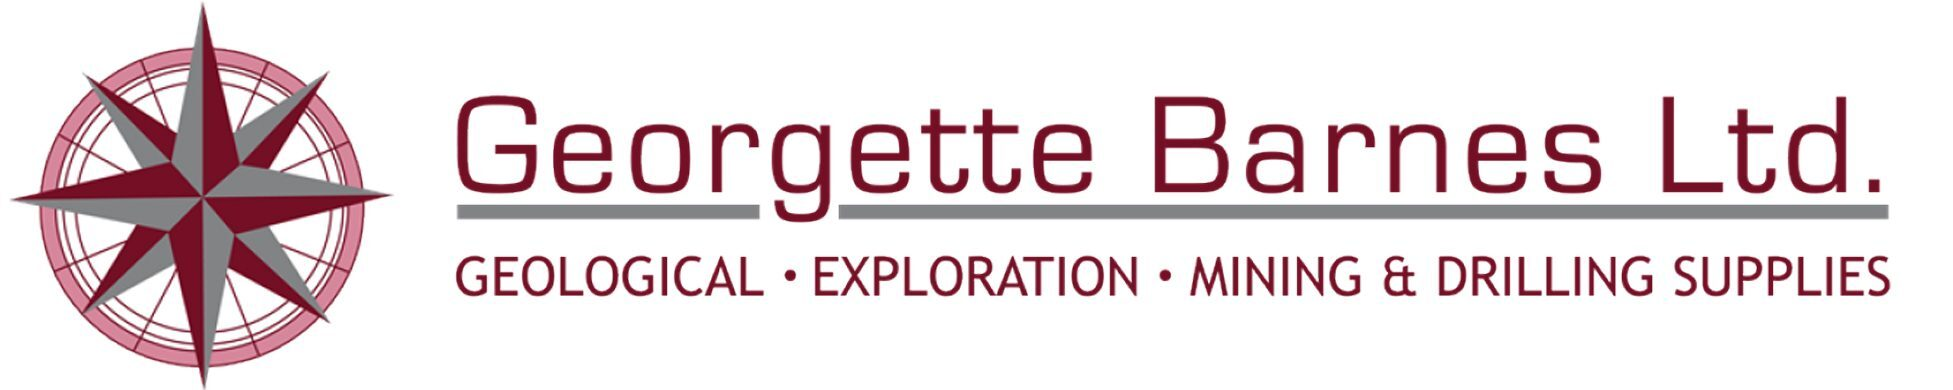 Georgette Barnes Ltd.